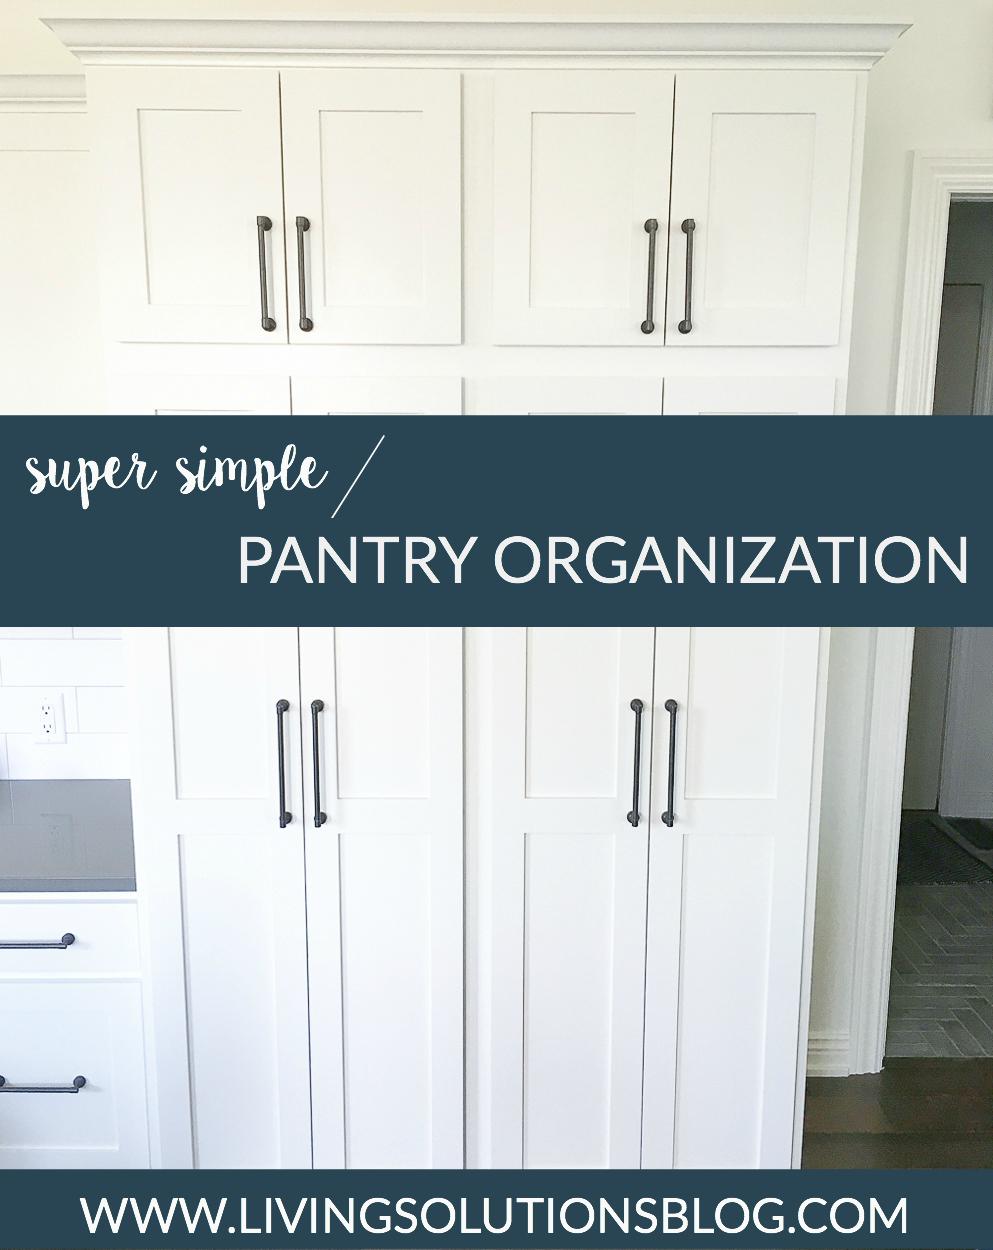 Super Simple Pantry Organization - Living Solutions blog